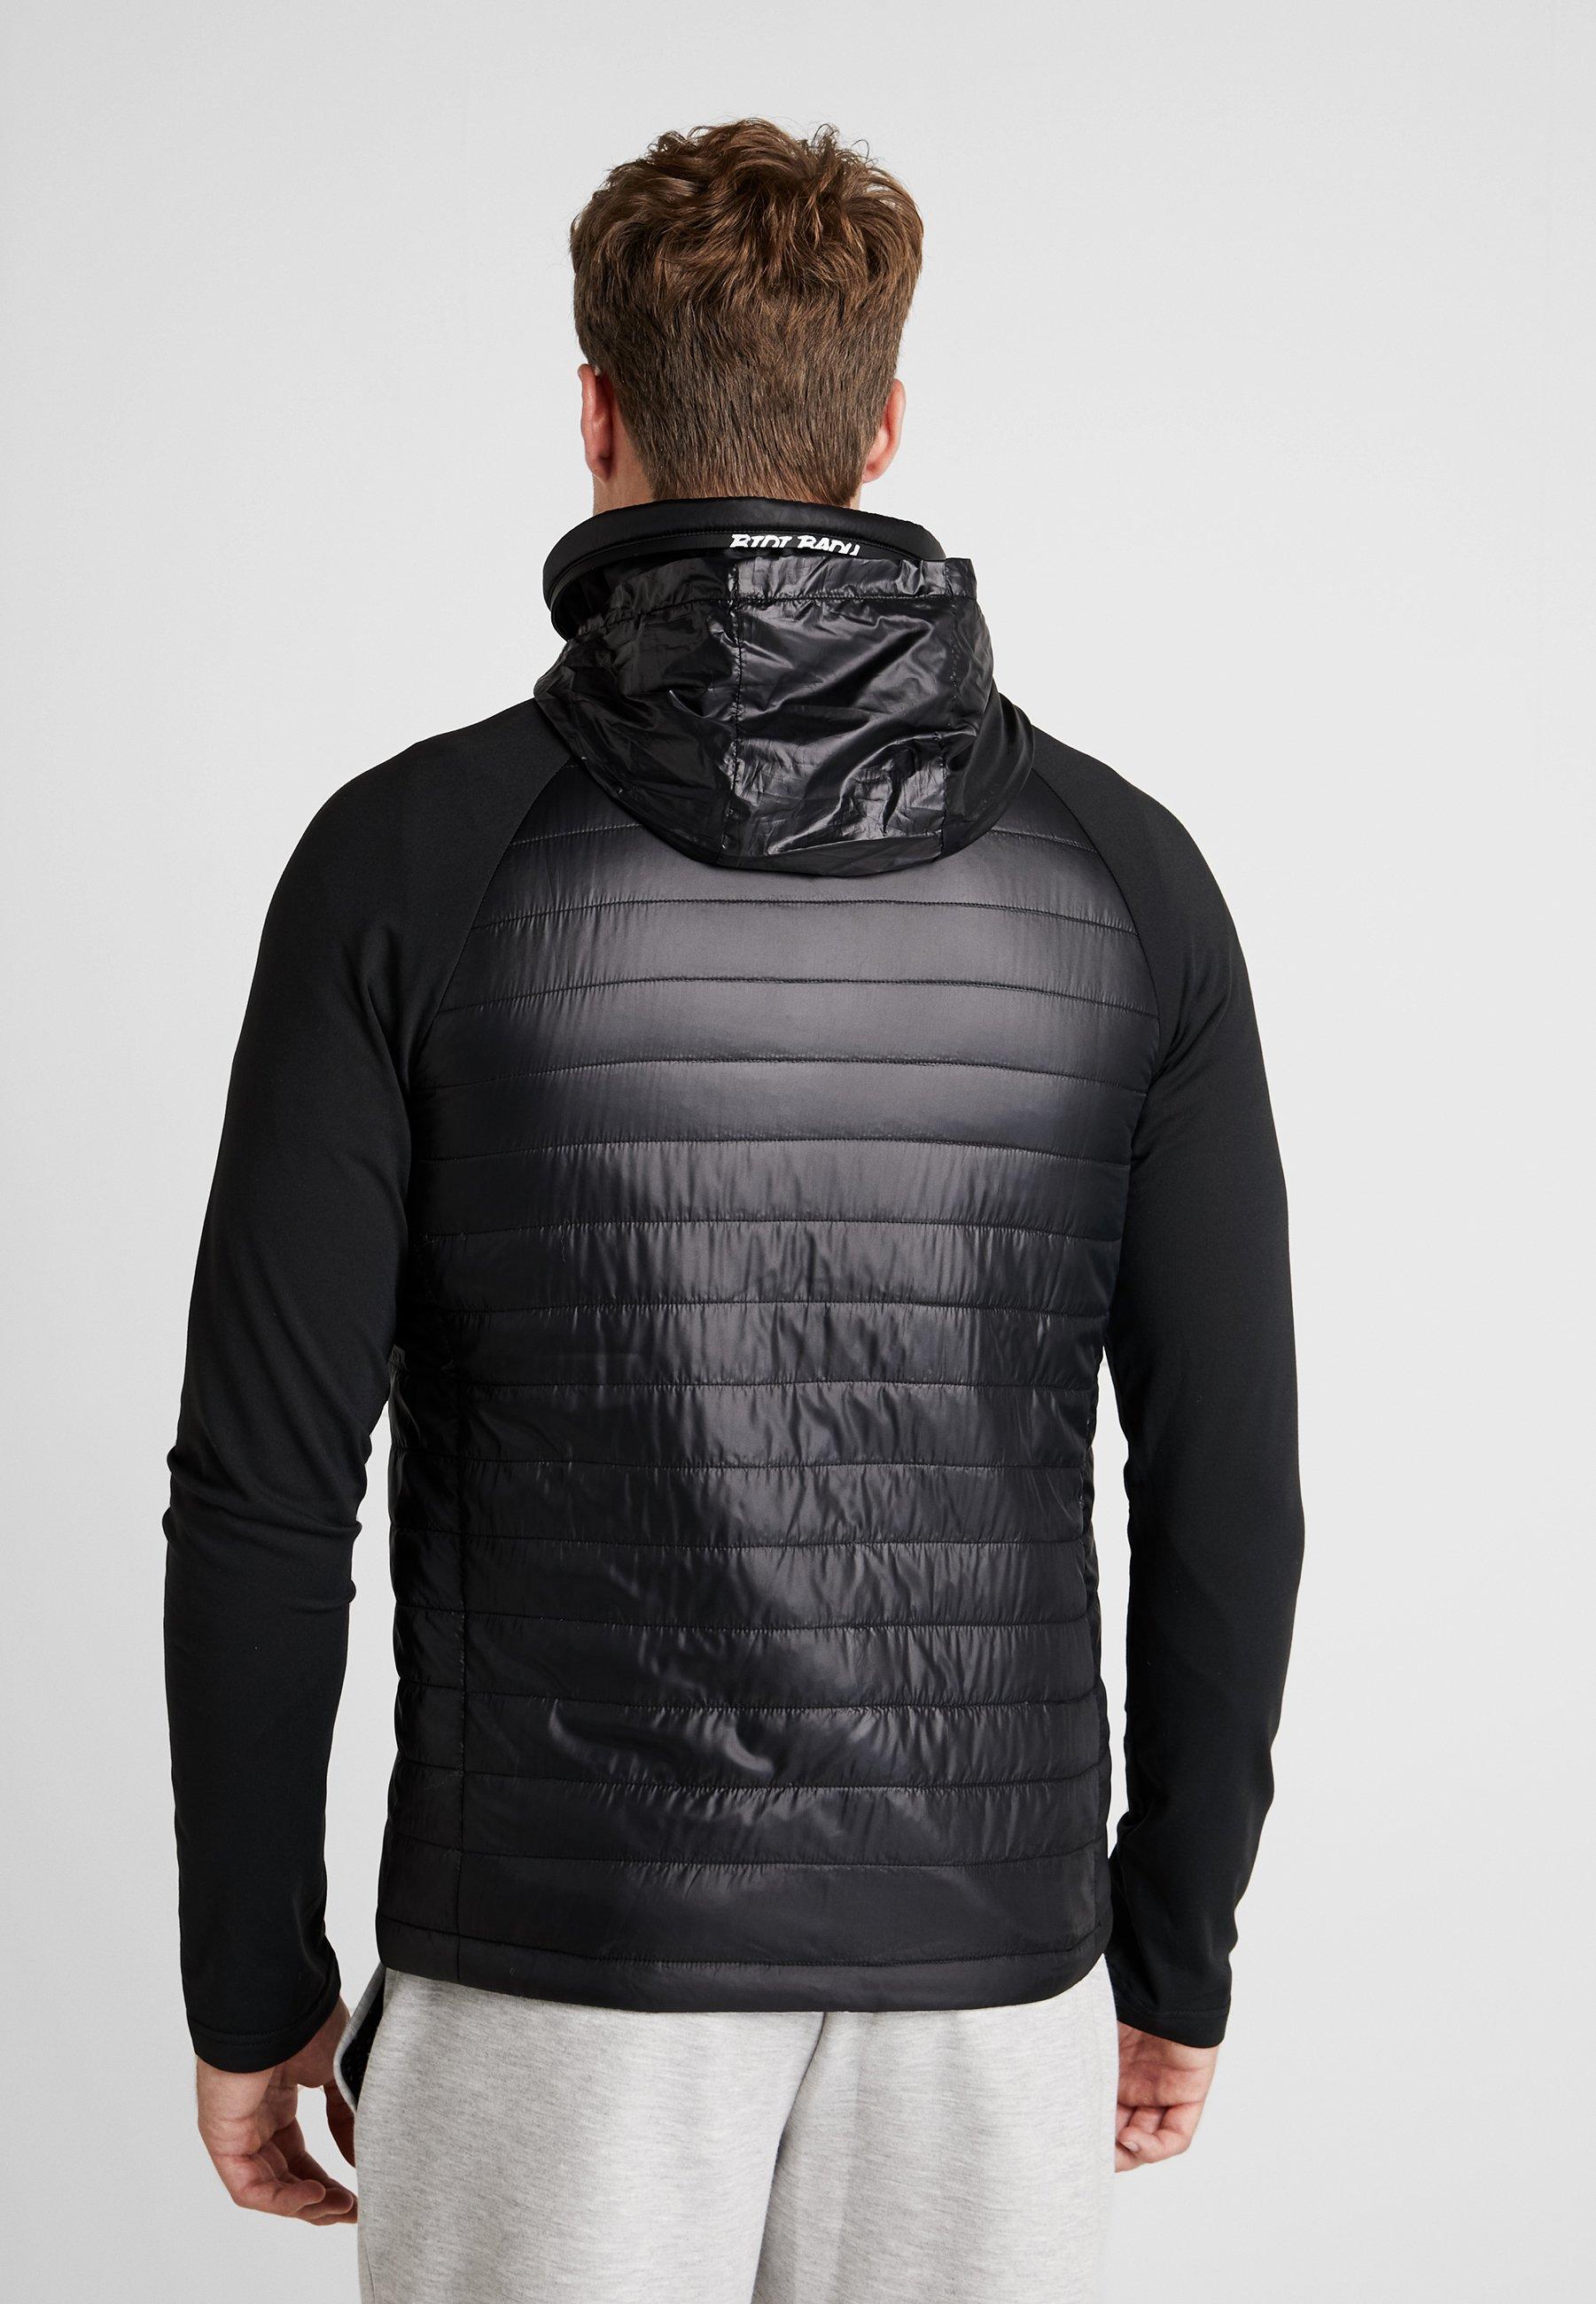 2020 New Men's Clothing BIDI BADU PANDU TECH JACKET Outdoor jacket black 5T5mxGtKE